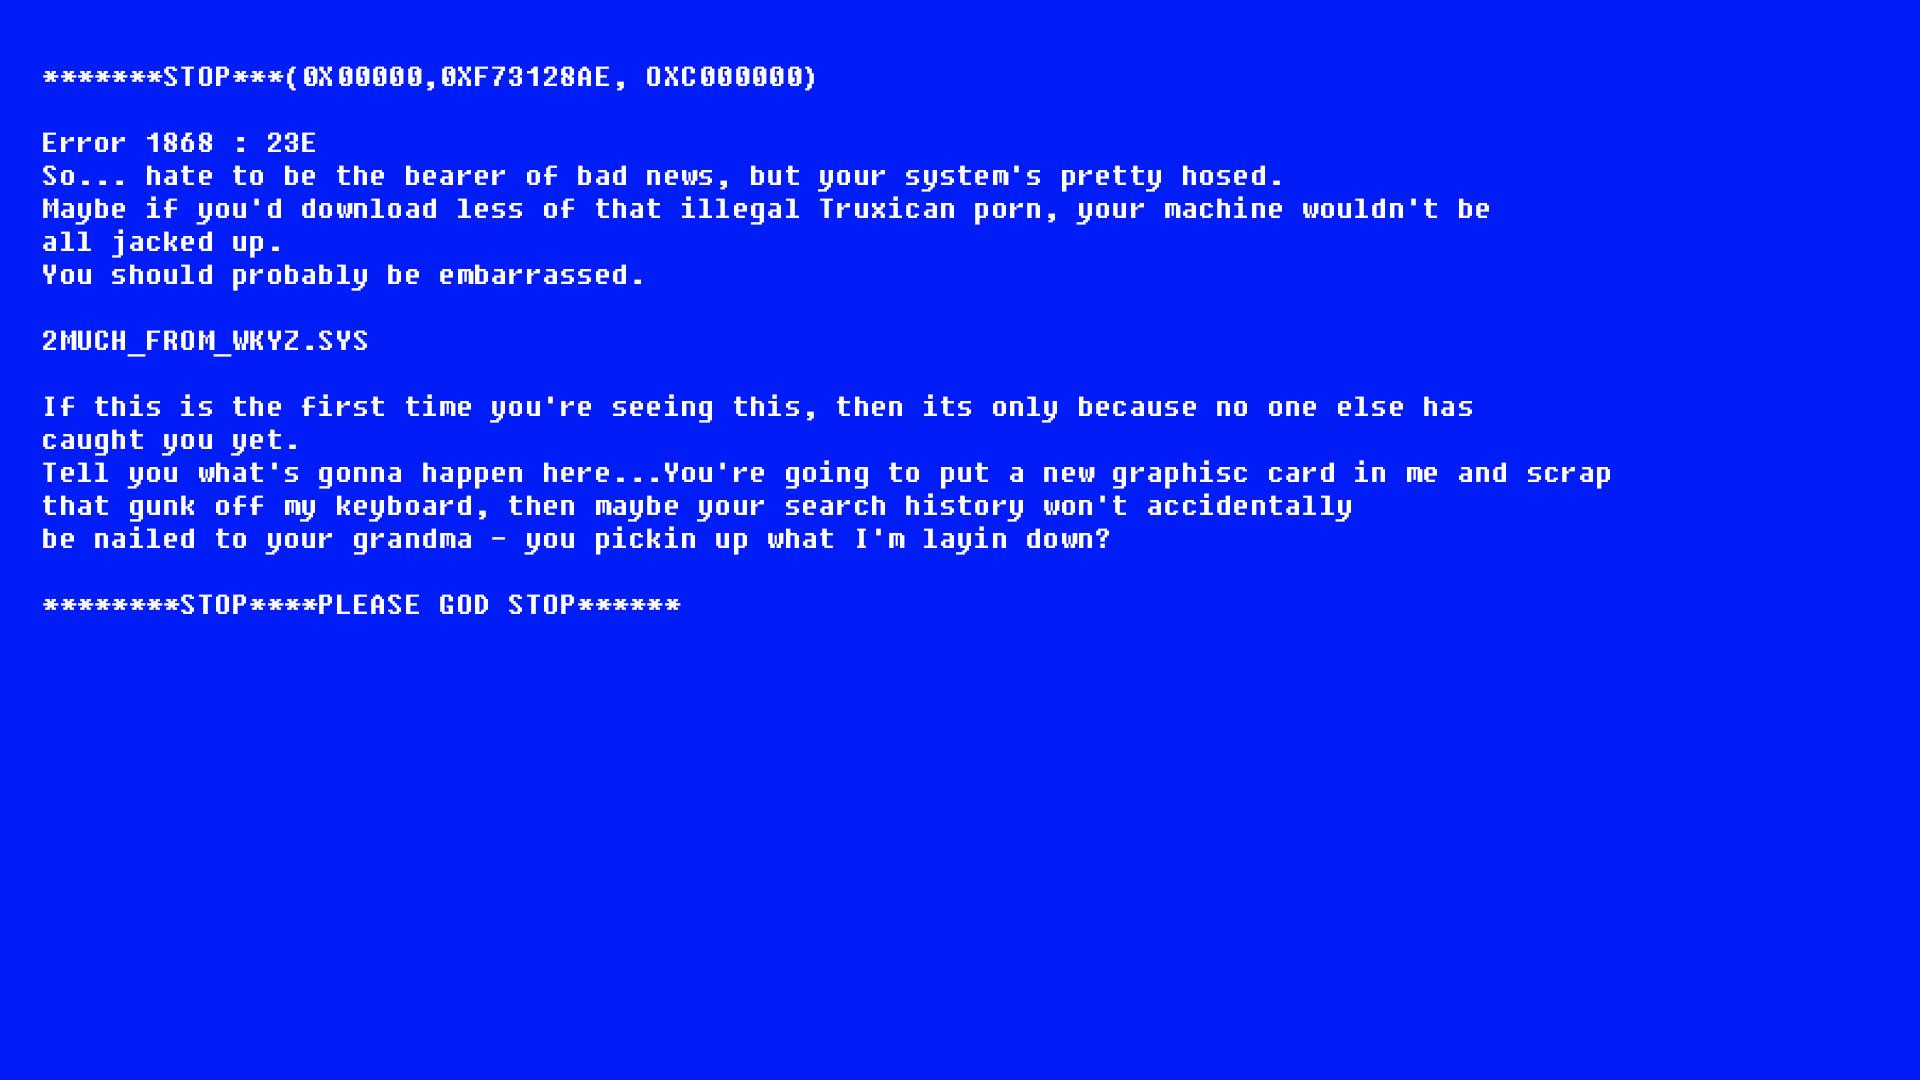 How To Fix Blue Screen of Death  1855-422-8557 BSOD Error